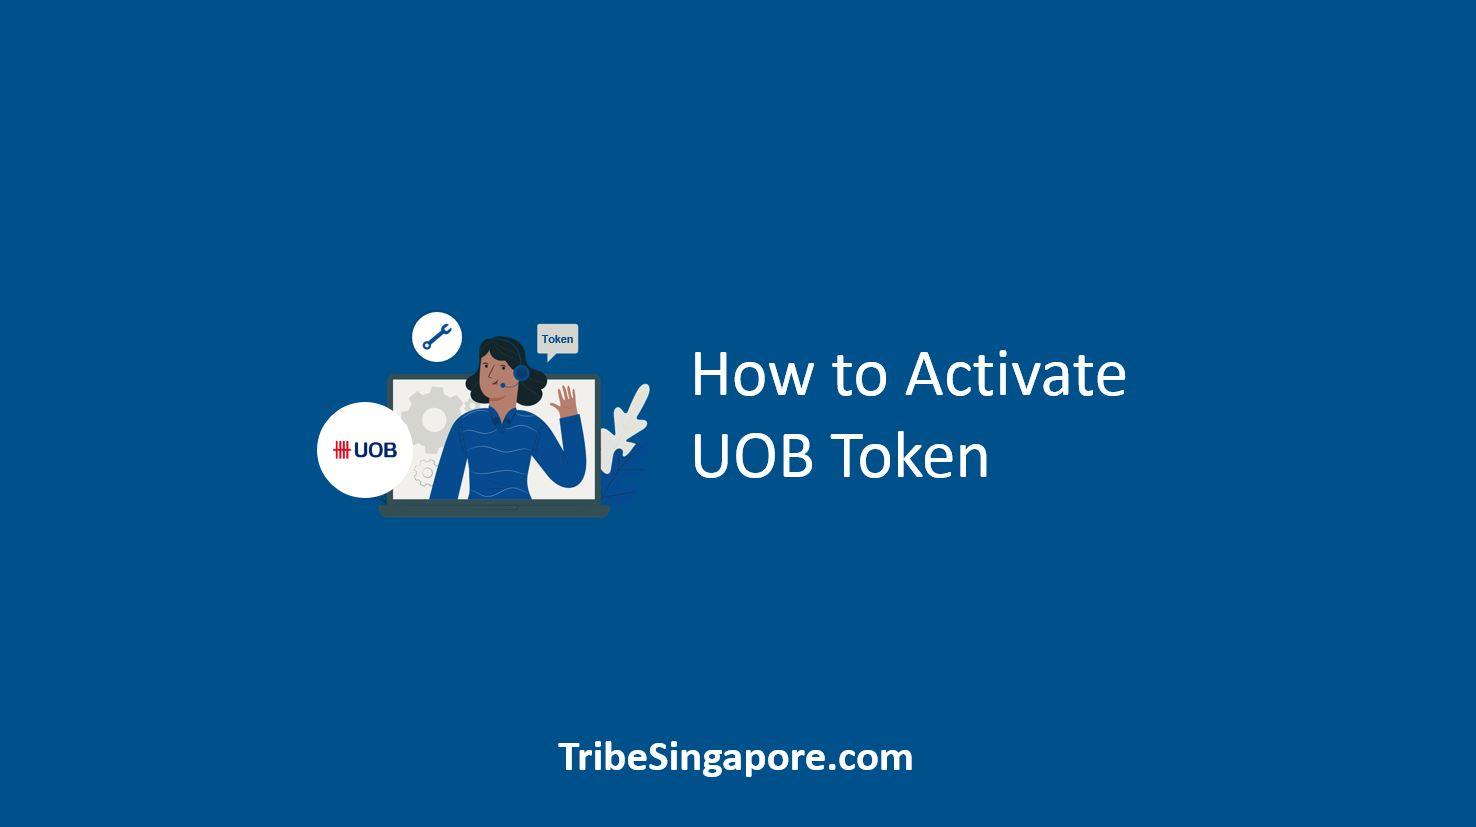 How to Activate UOB Token